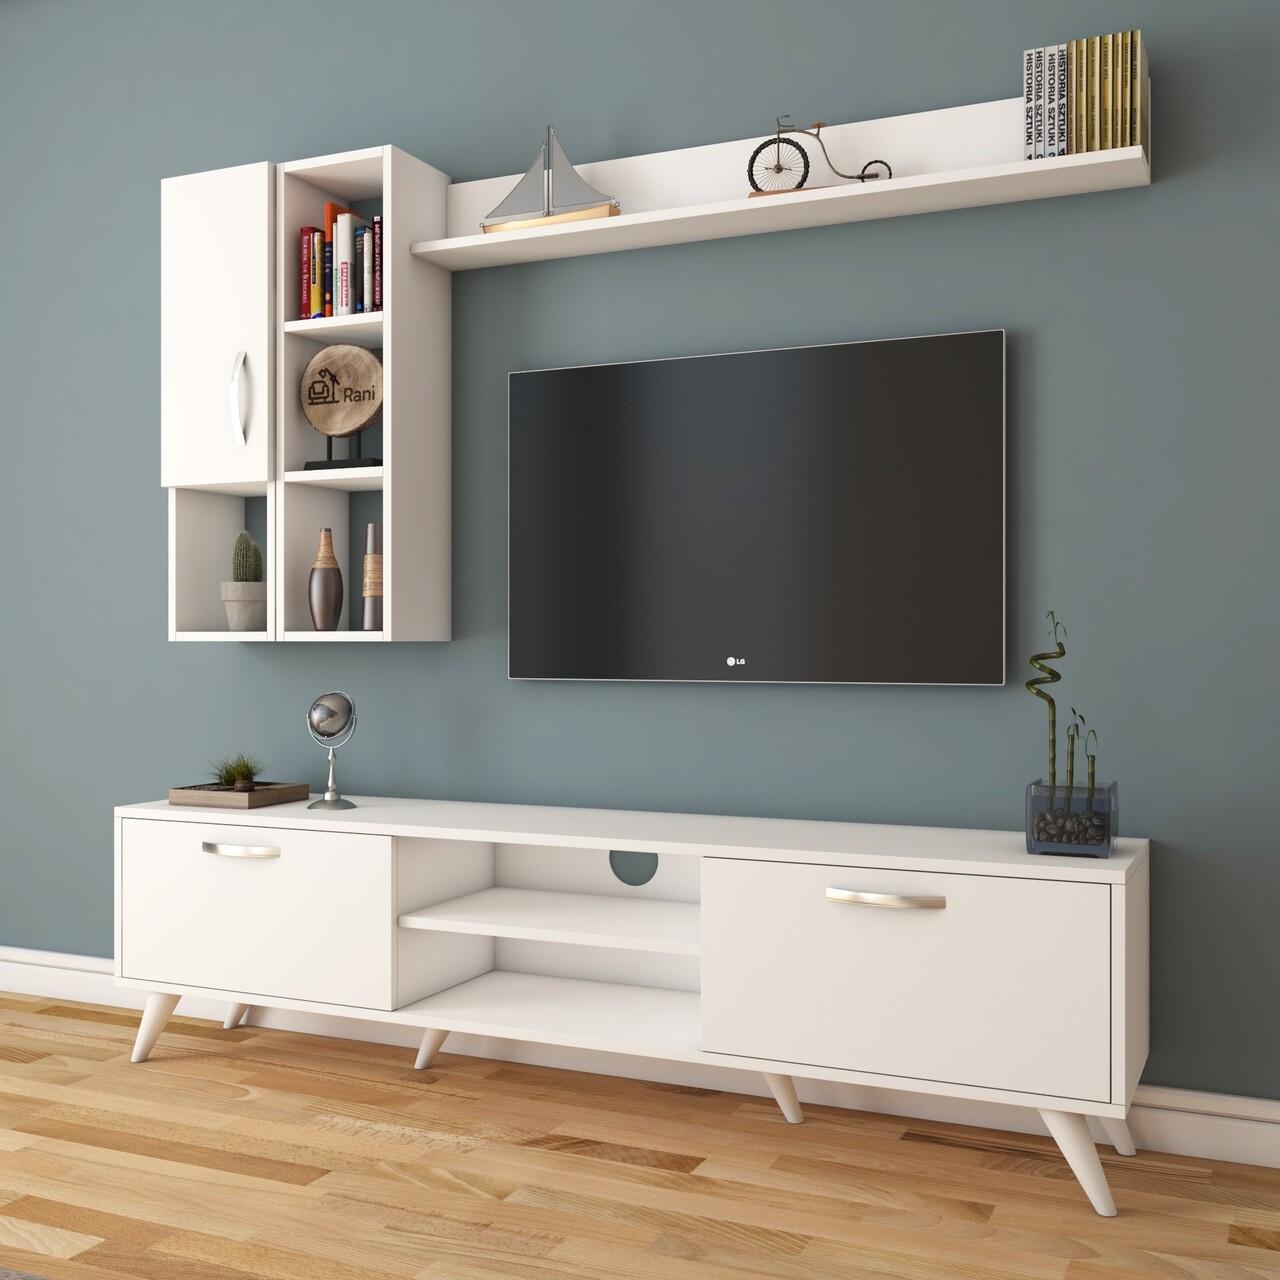 Comoda TV cu 2 rafturi de perete si cabinet M44 - 316, Wren, 180 x 35 x 48.6 cm/90 cm/133 cm, white